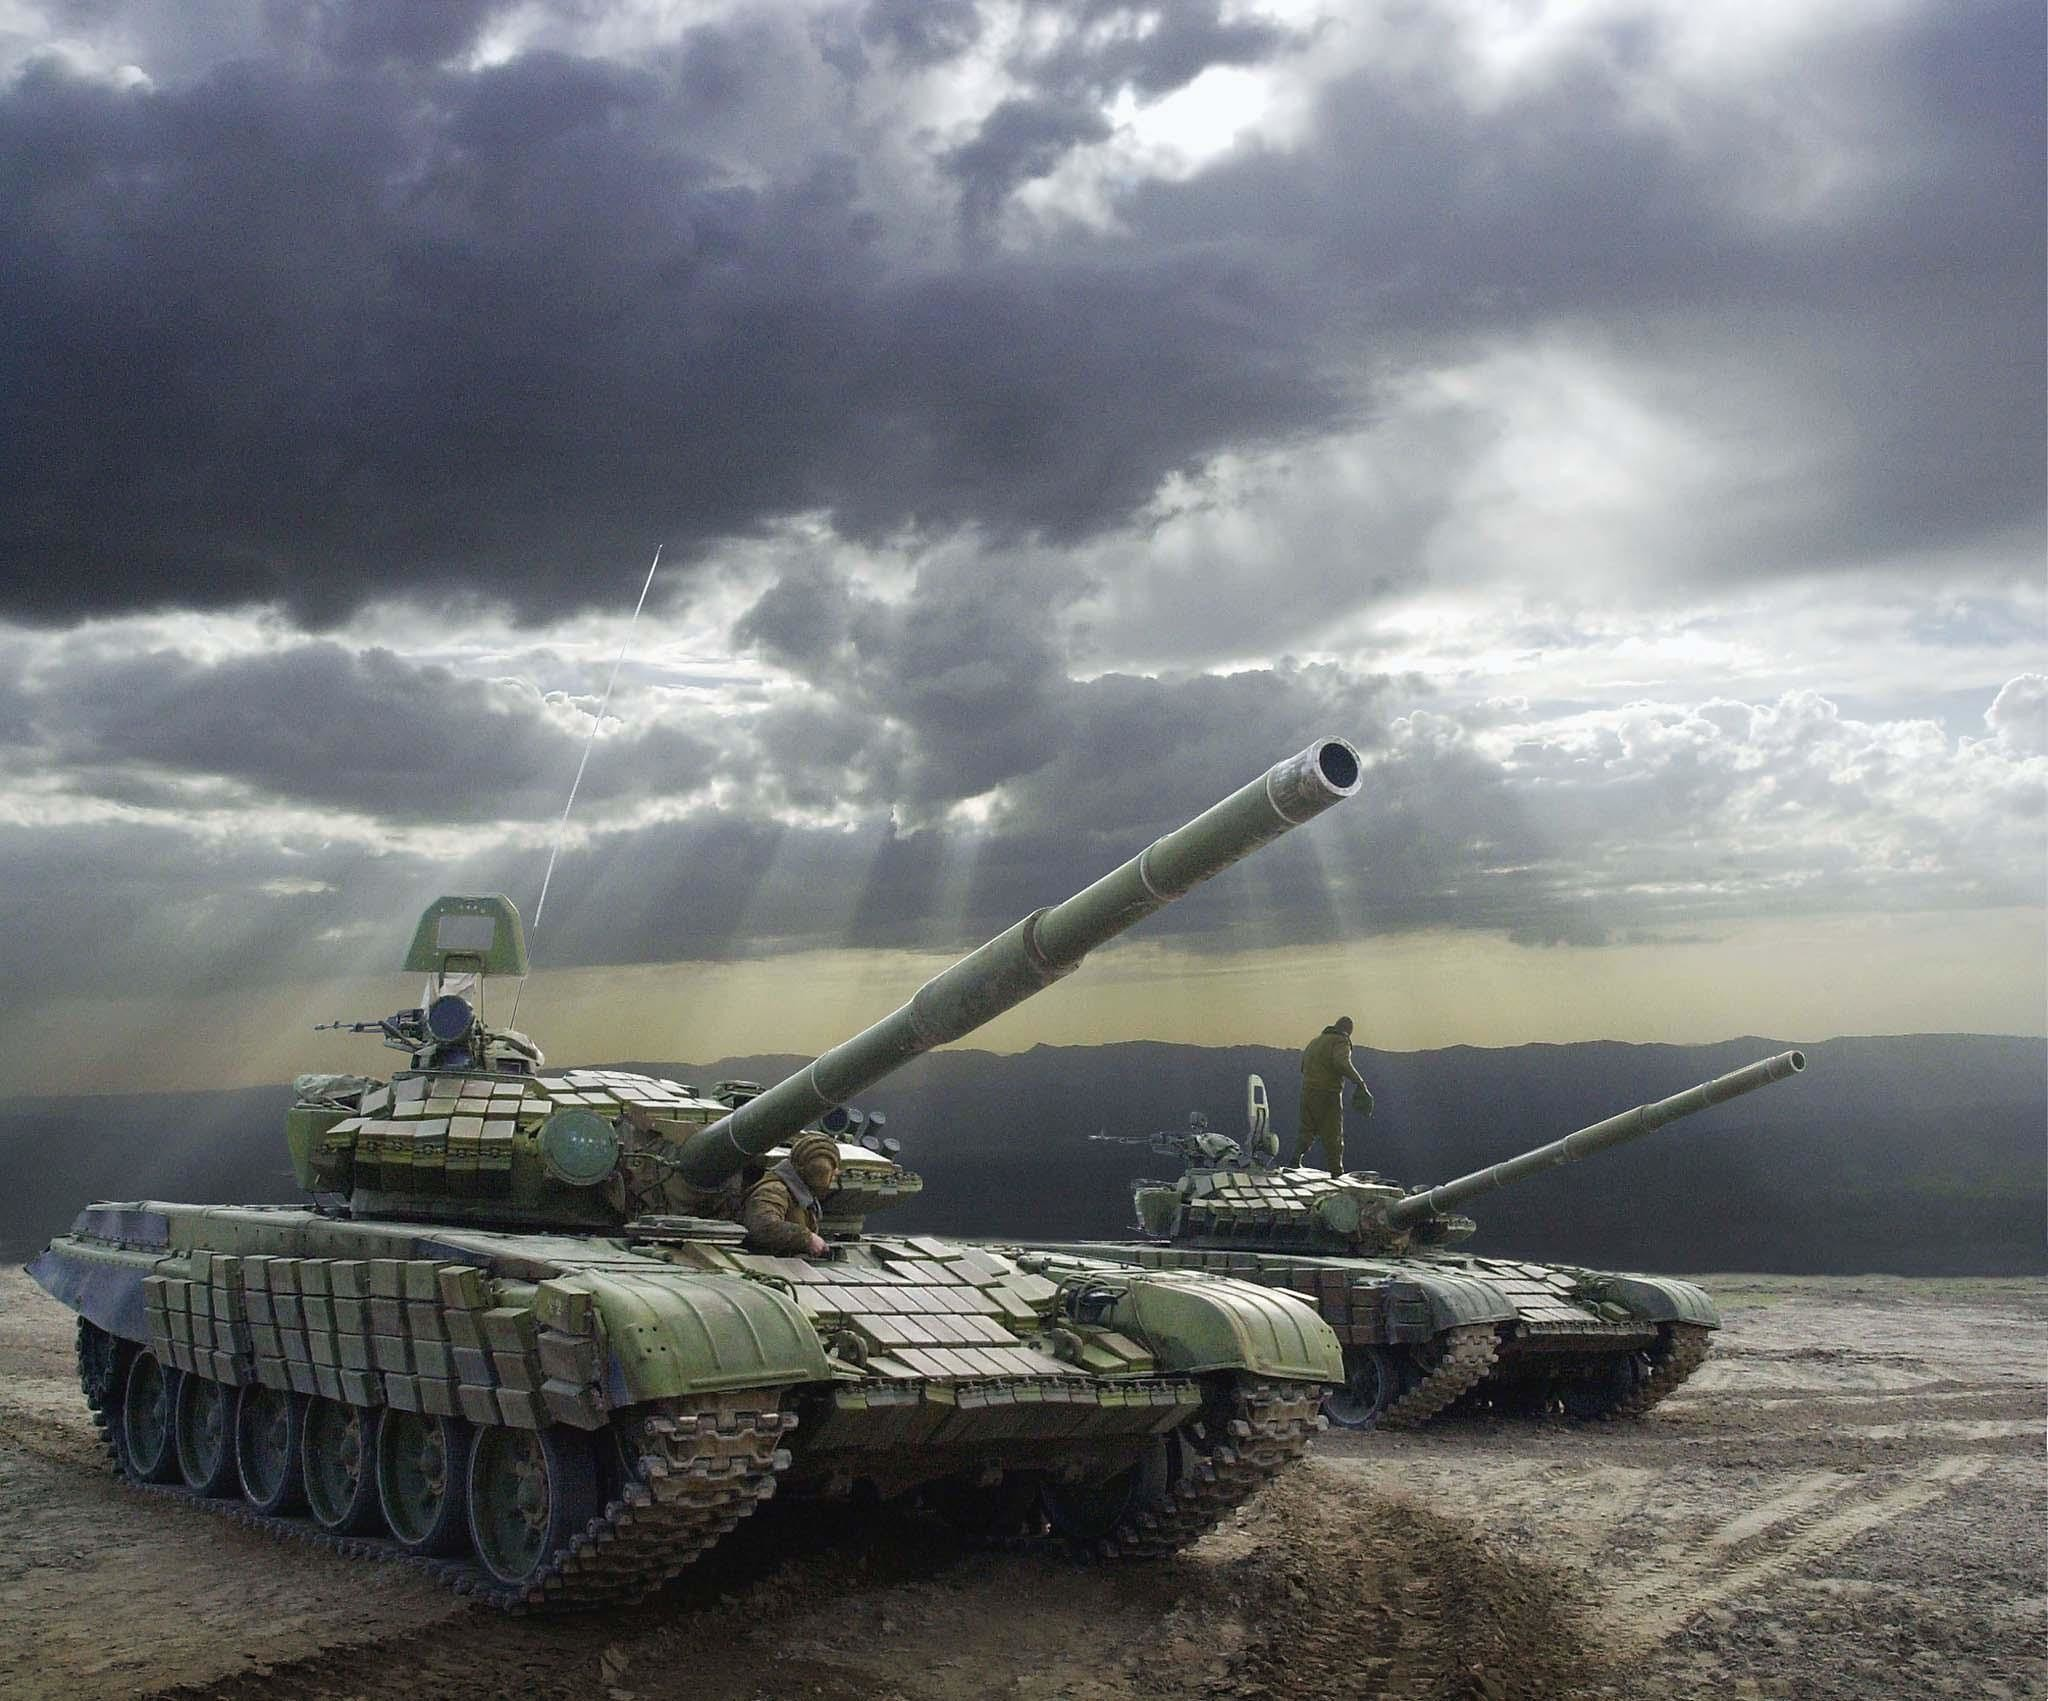 … tank wallpapers 20 …